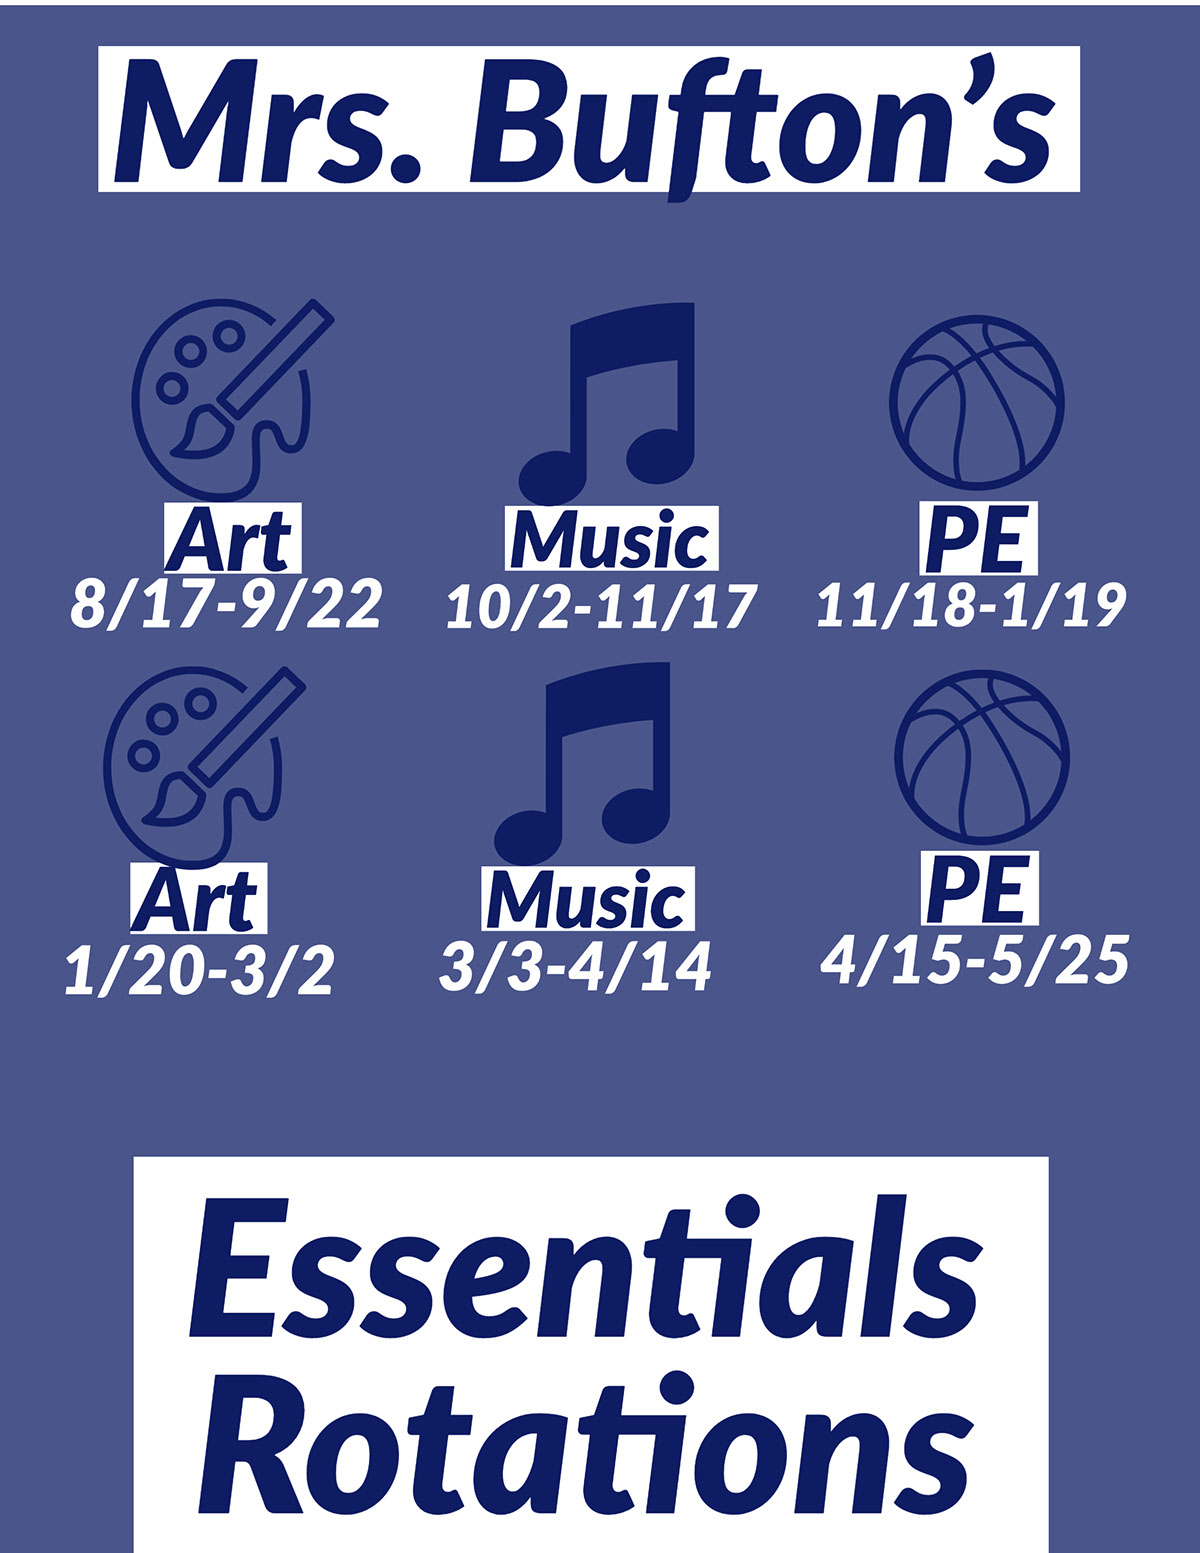 Mrs. Bufton's Essentials  Essentials Rotations Mrs. Bufton's PE PE Art Art Music Music 8/17-9/22 1/20-3/2 3/3-4/14 4/15-5/25 10/2-11/17 11/18-1/19